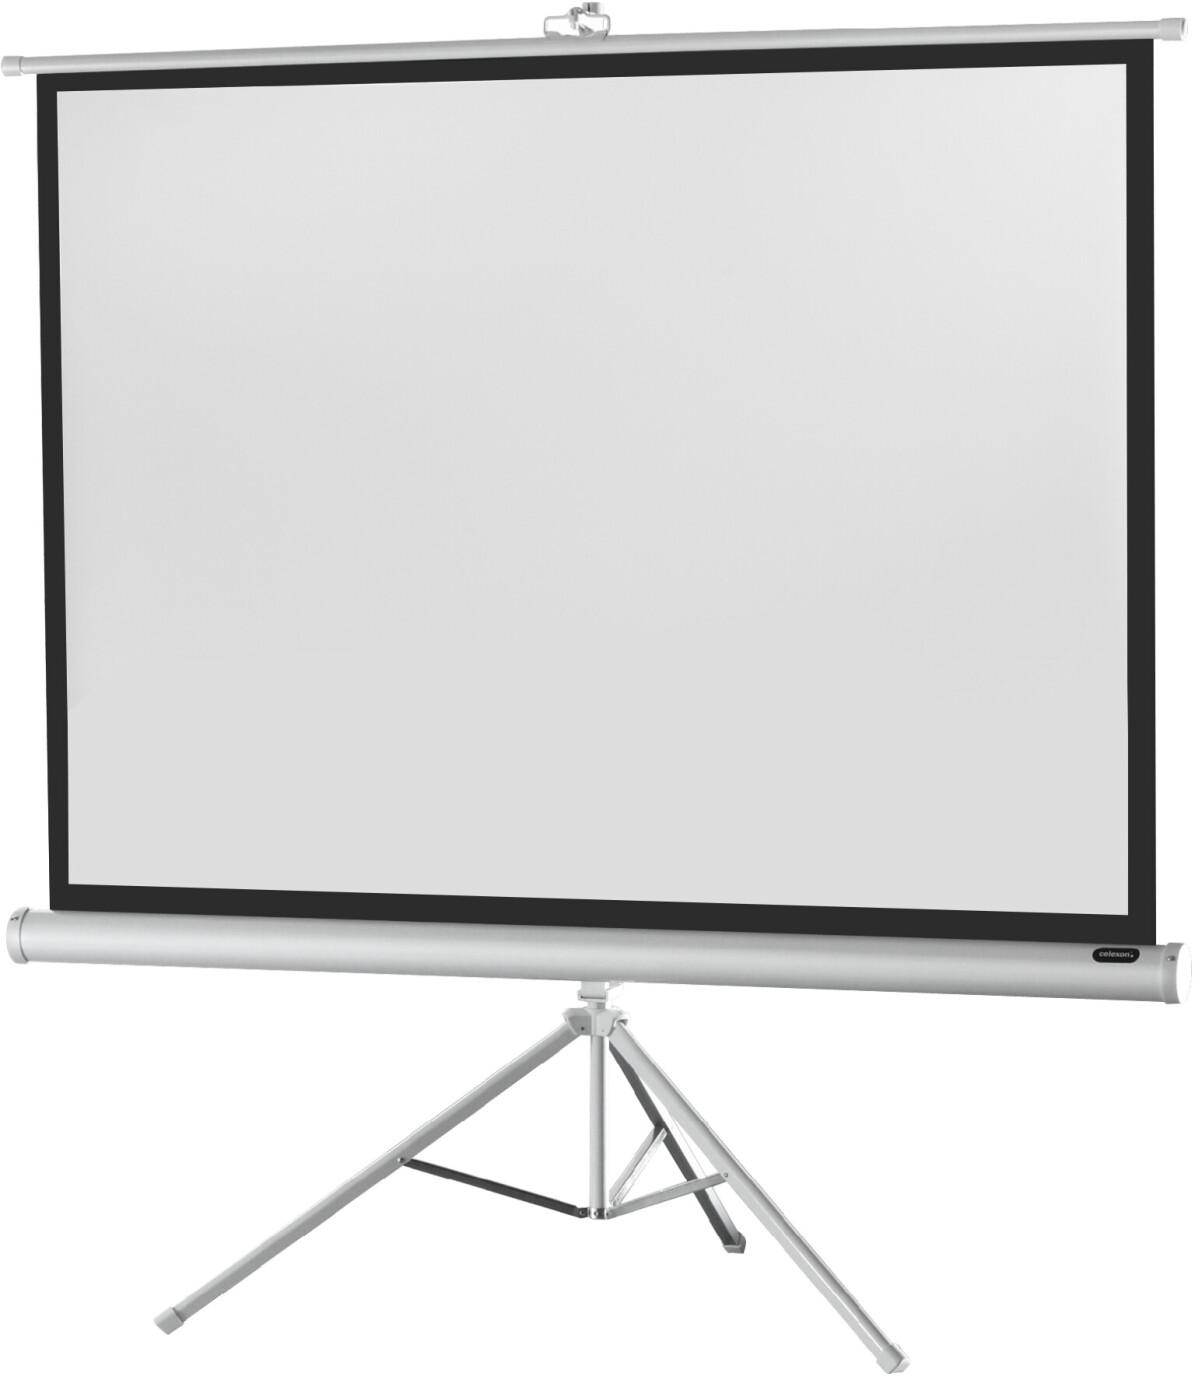 celexon Stativleinwand Economy 176 x 132 cm - White Edition